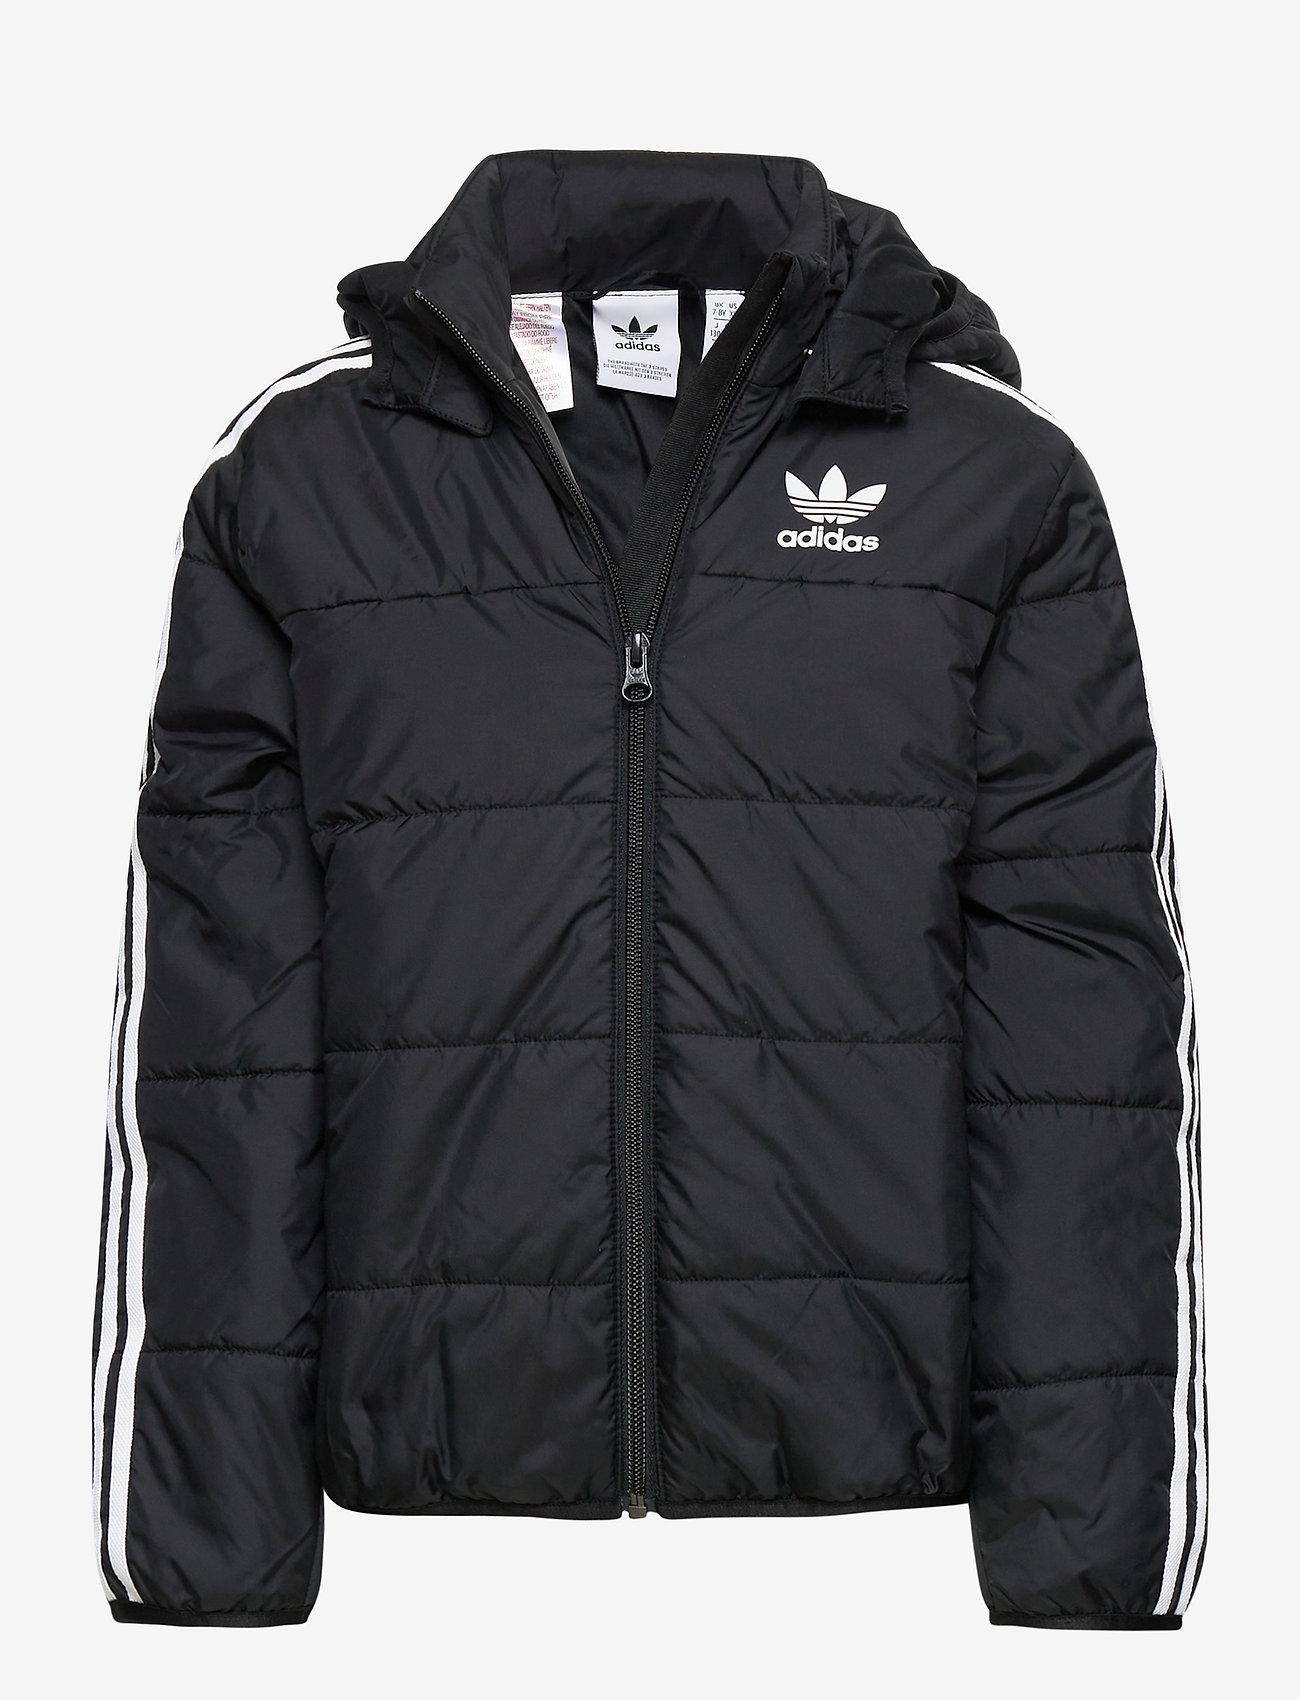 69.95 €) - adidas Originals - | Boozt